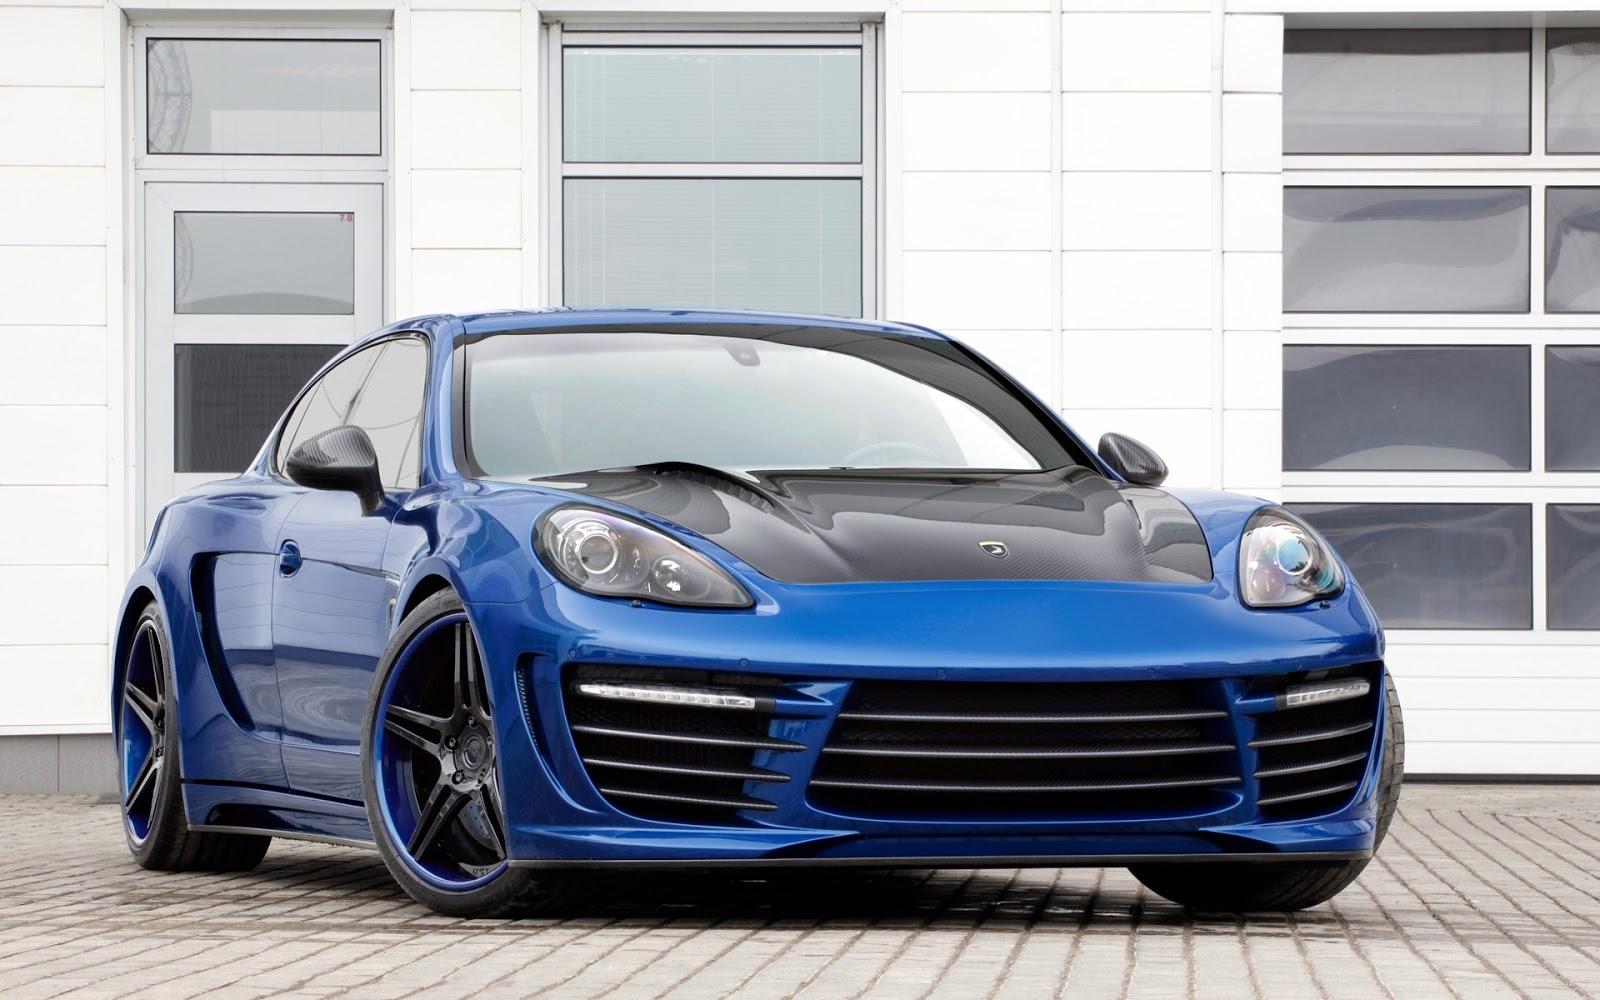 http://2.bp.blogspot.com/-E1lpZi8FLwk/UPXAi0nHtBI/AAAAAAAAzTw/l_4HiD4L5wM/s1600/Porsche-Panamera-Stingray-GTR-1920x1200-Wallpapers_Fondos-de-Pantalla-de-Carros.jpg